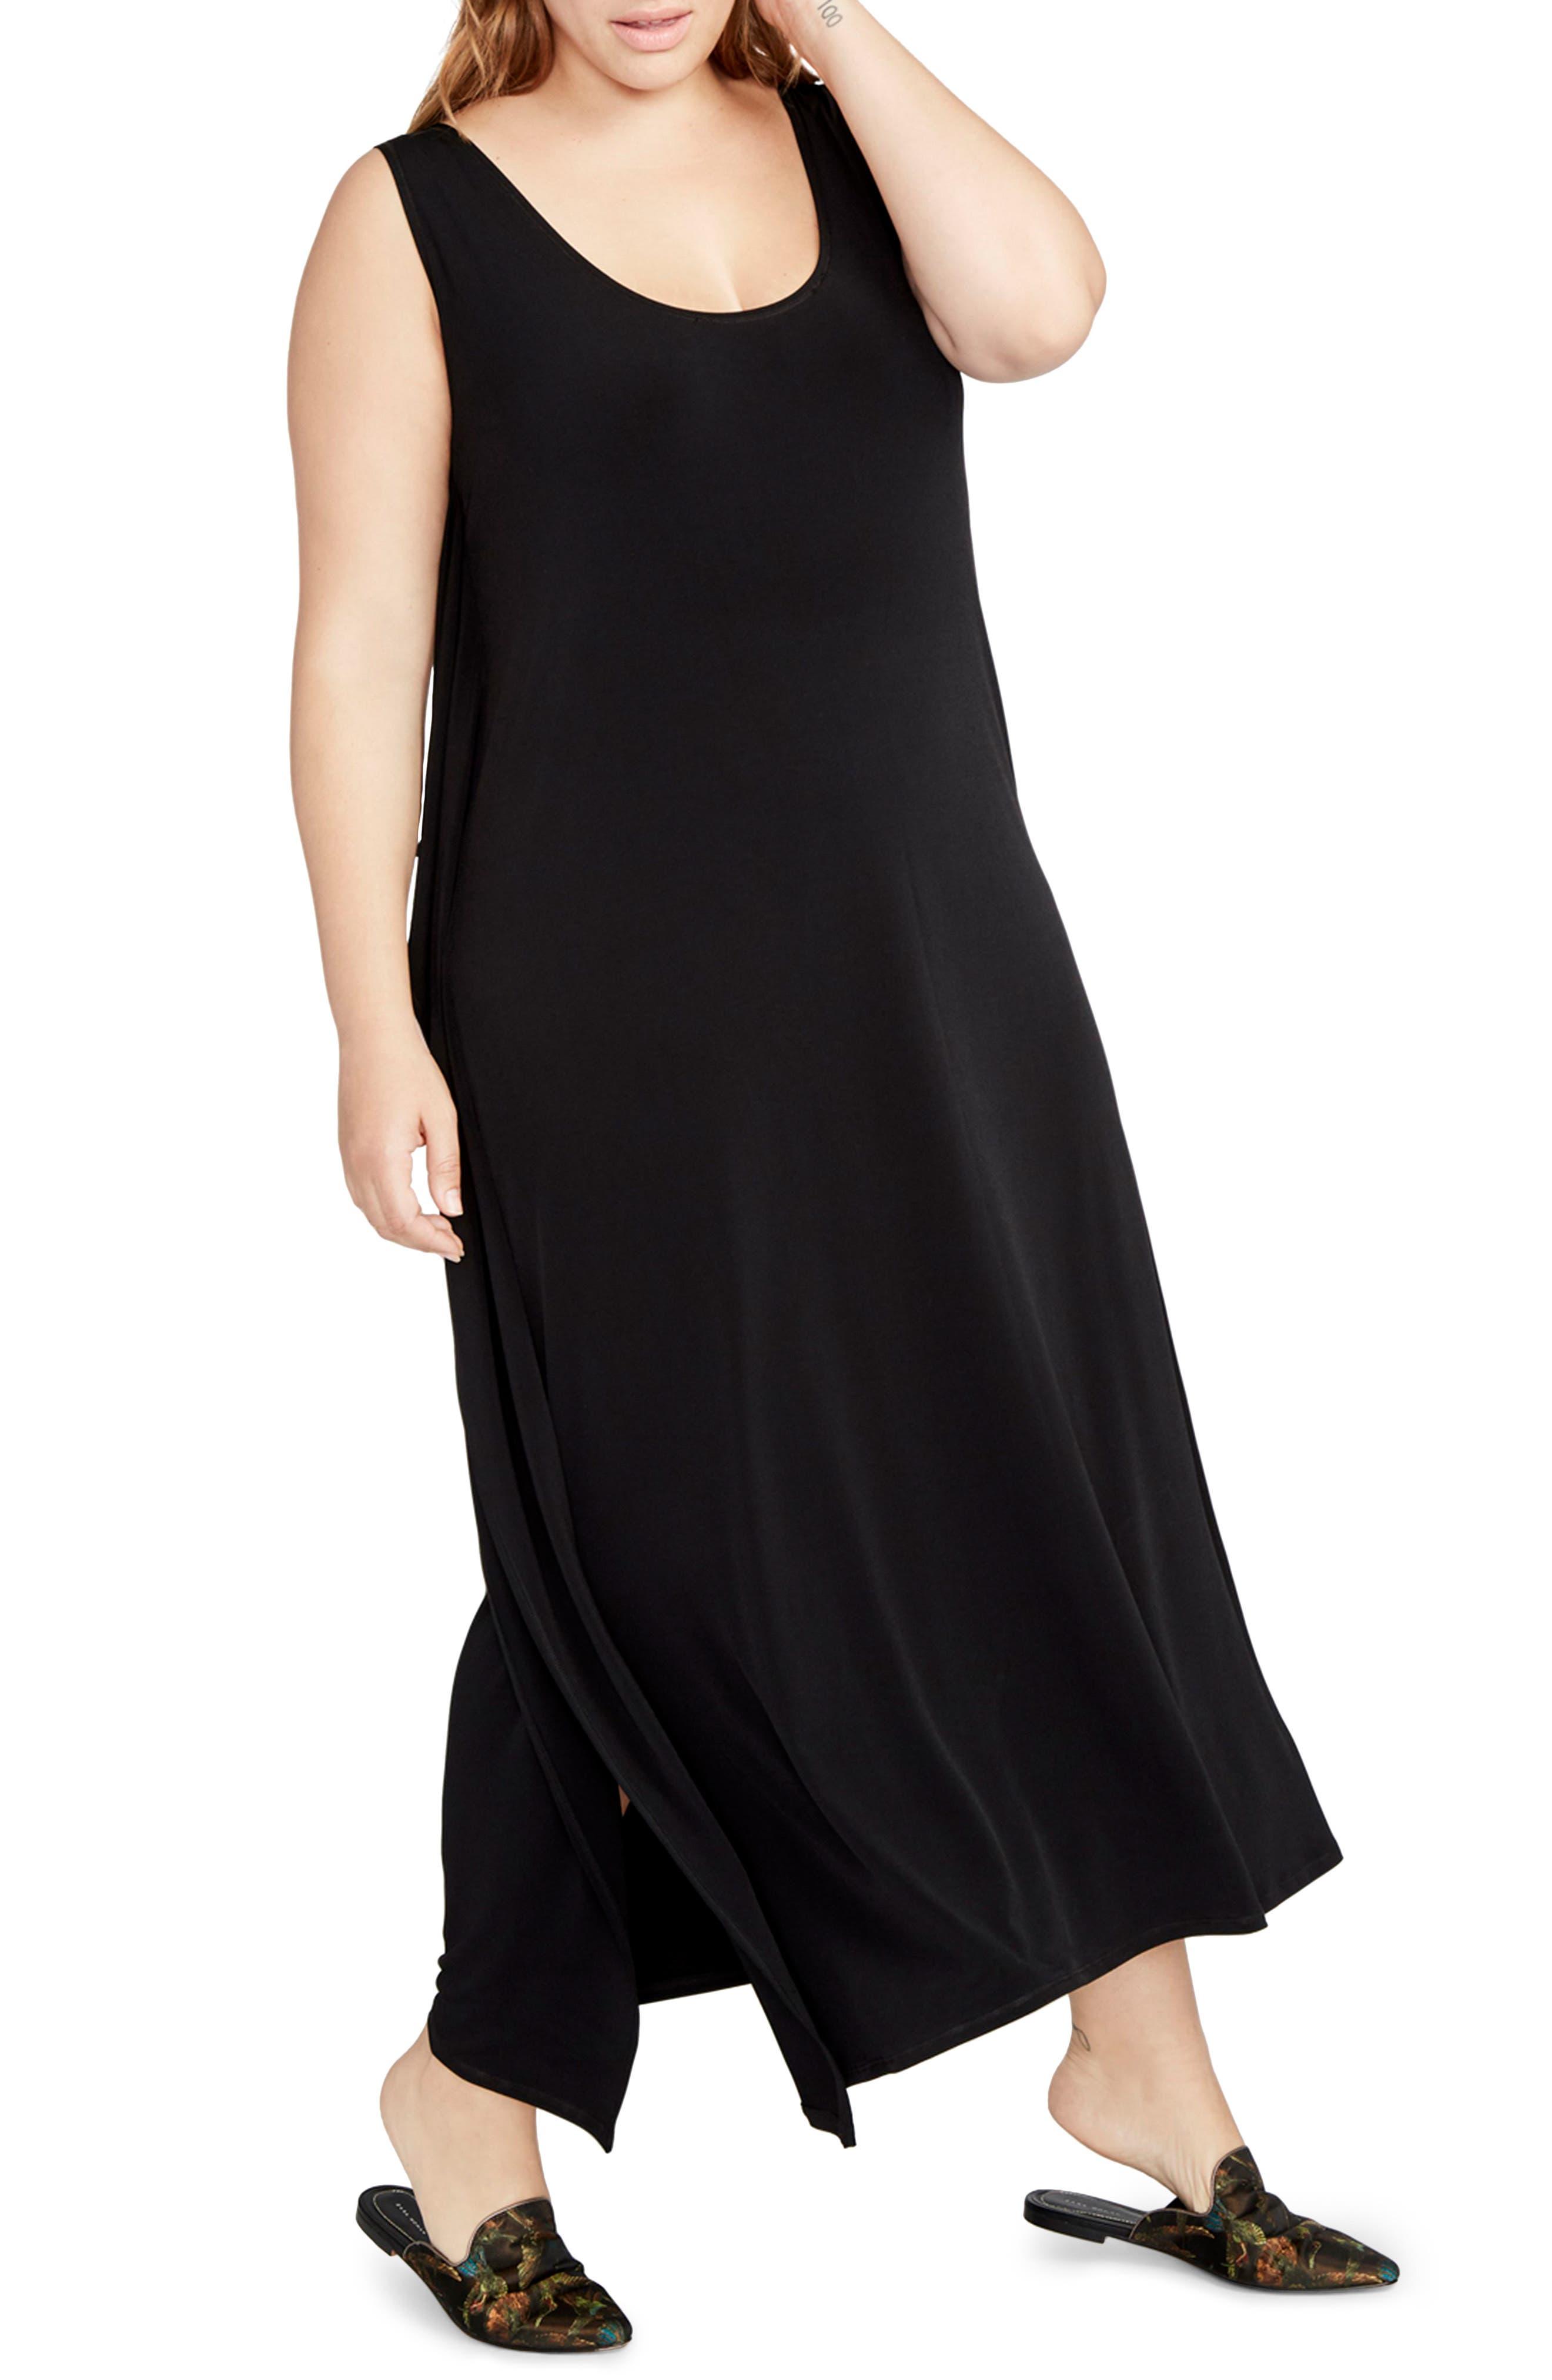 Alternate Image 1 Selected - RACHEL Rachel Roy Side Drape Maxi Dress (Plus Size)